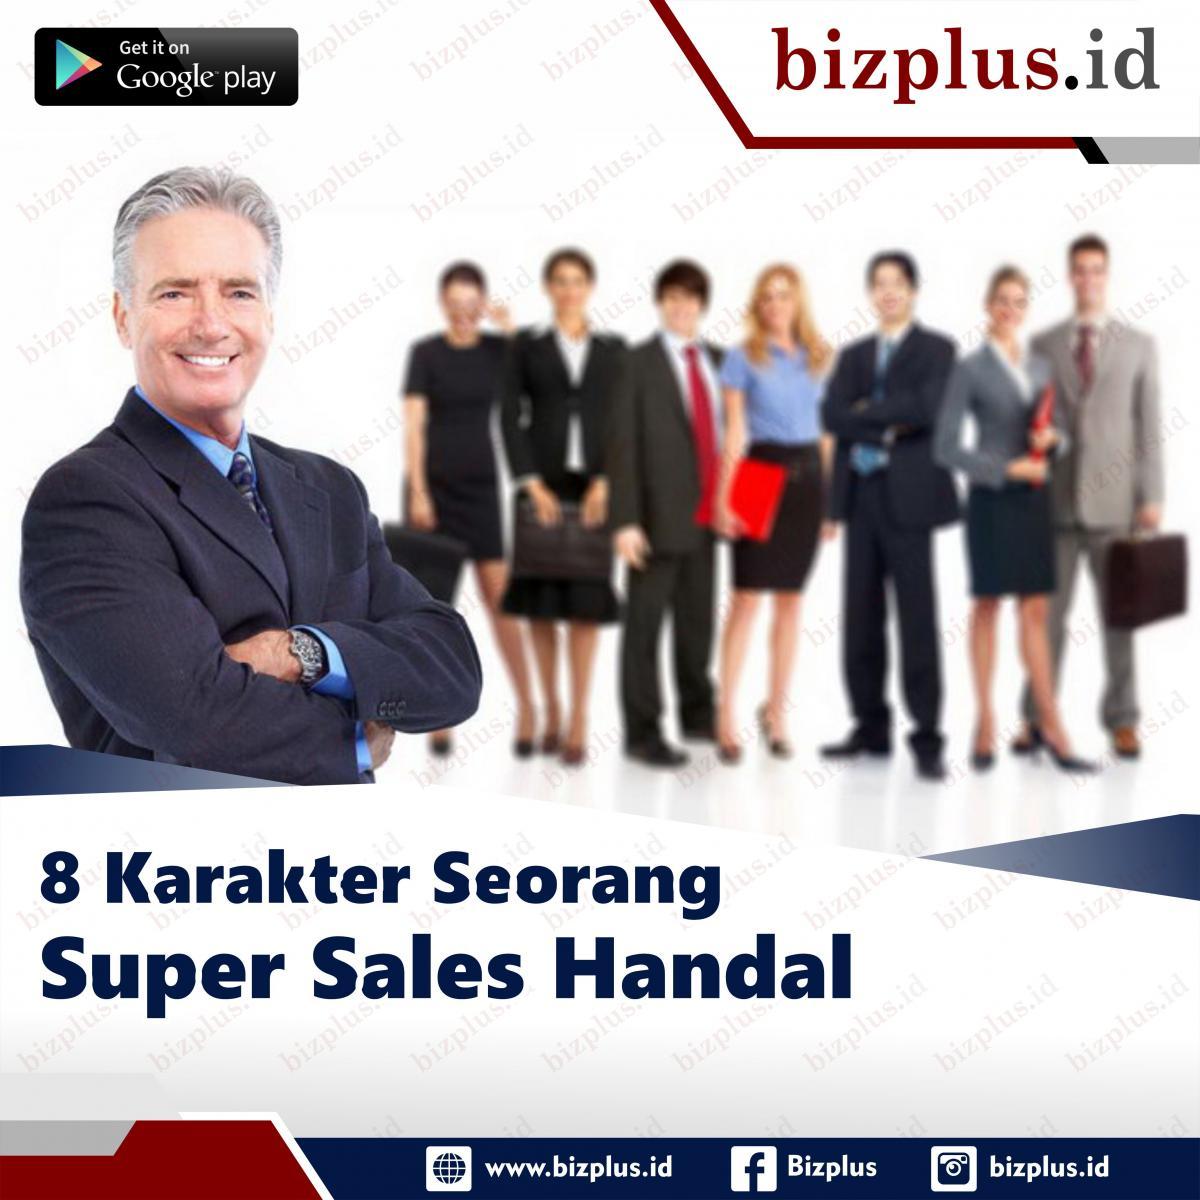 8 Karakter Seorang Super Sales Handal (Slide 1)